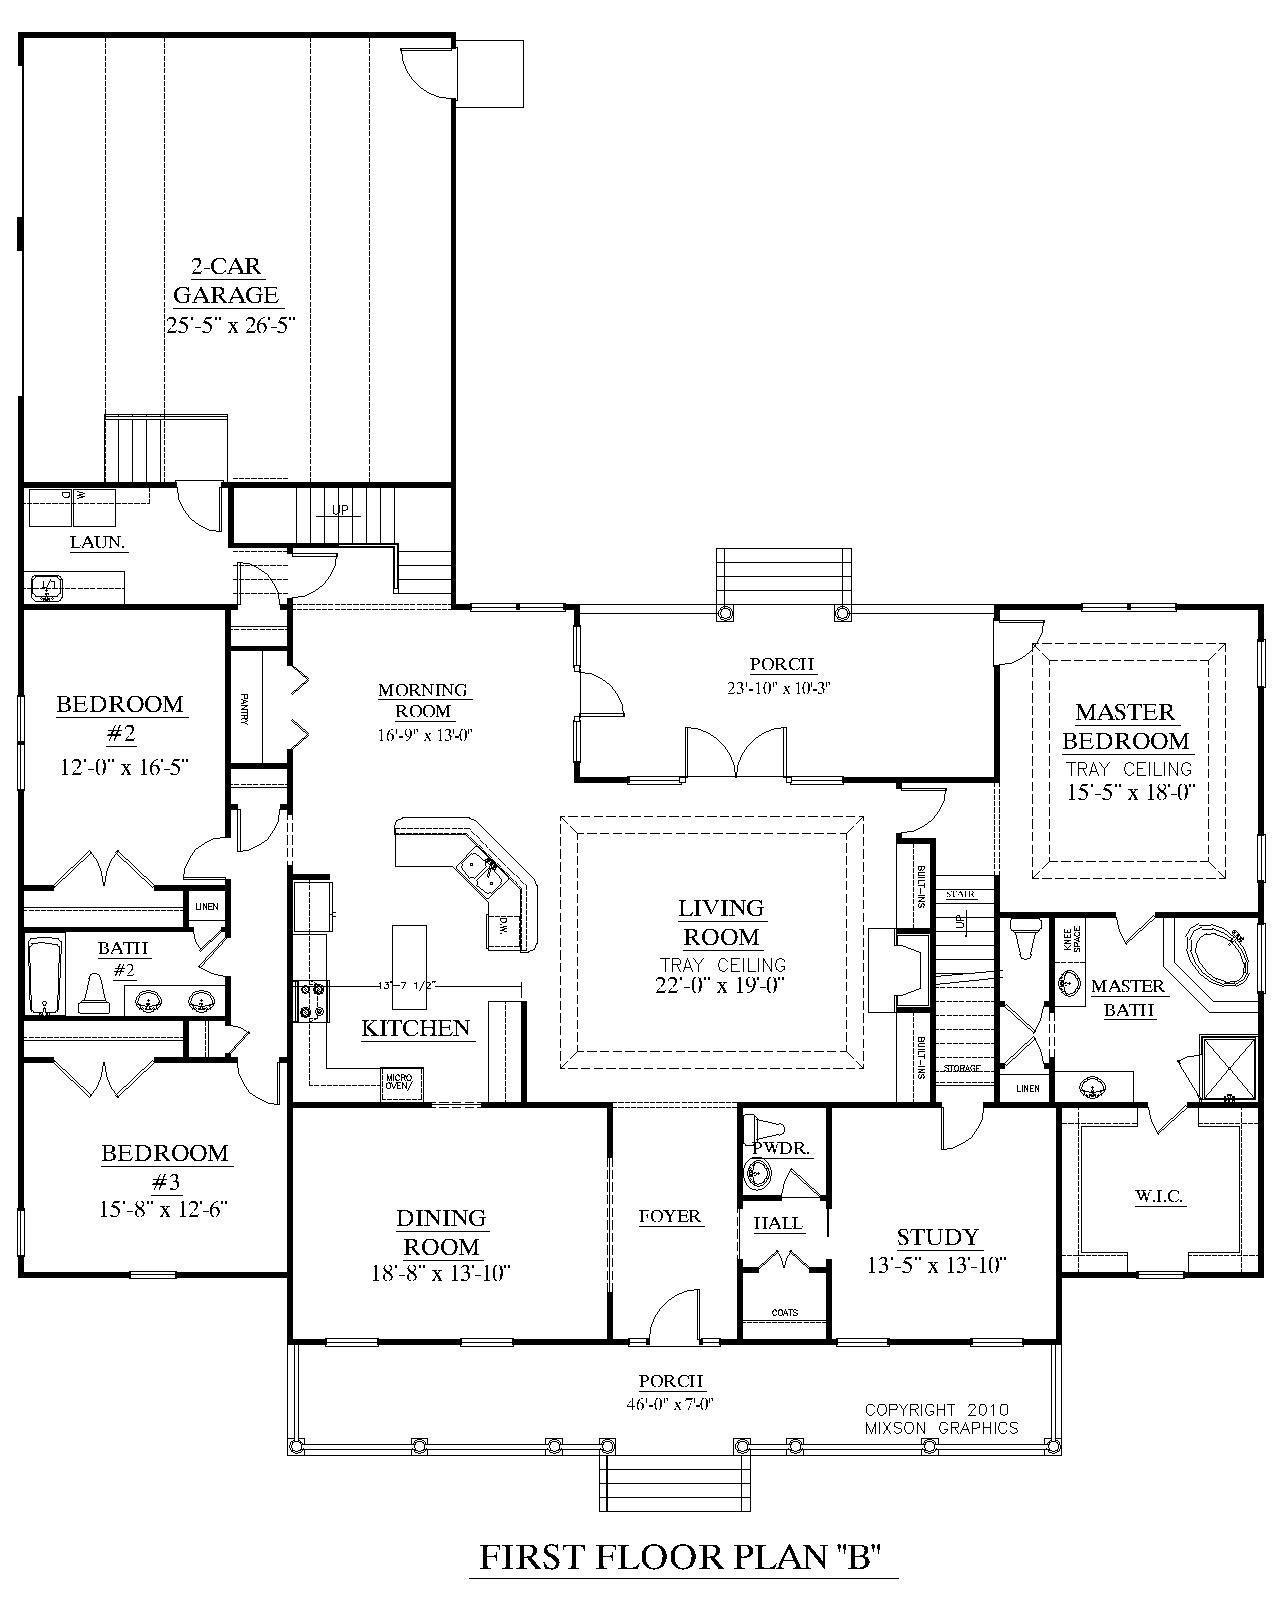 house plan 3027 b brookgreen b main floor house plans by house plan 3027 b brookgreen b main floor